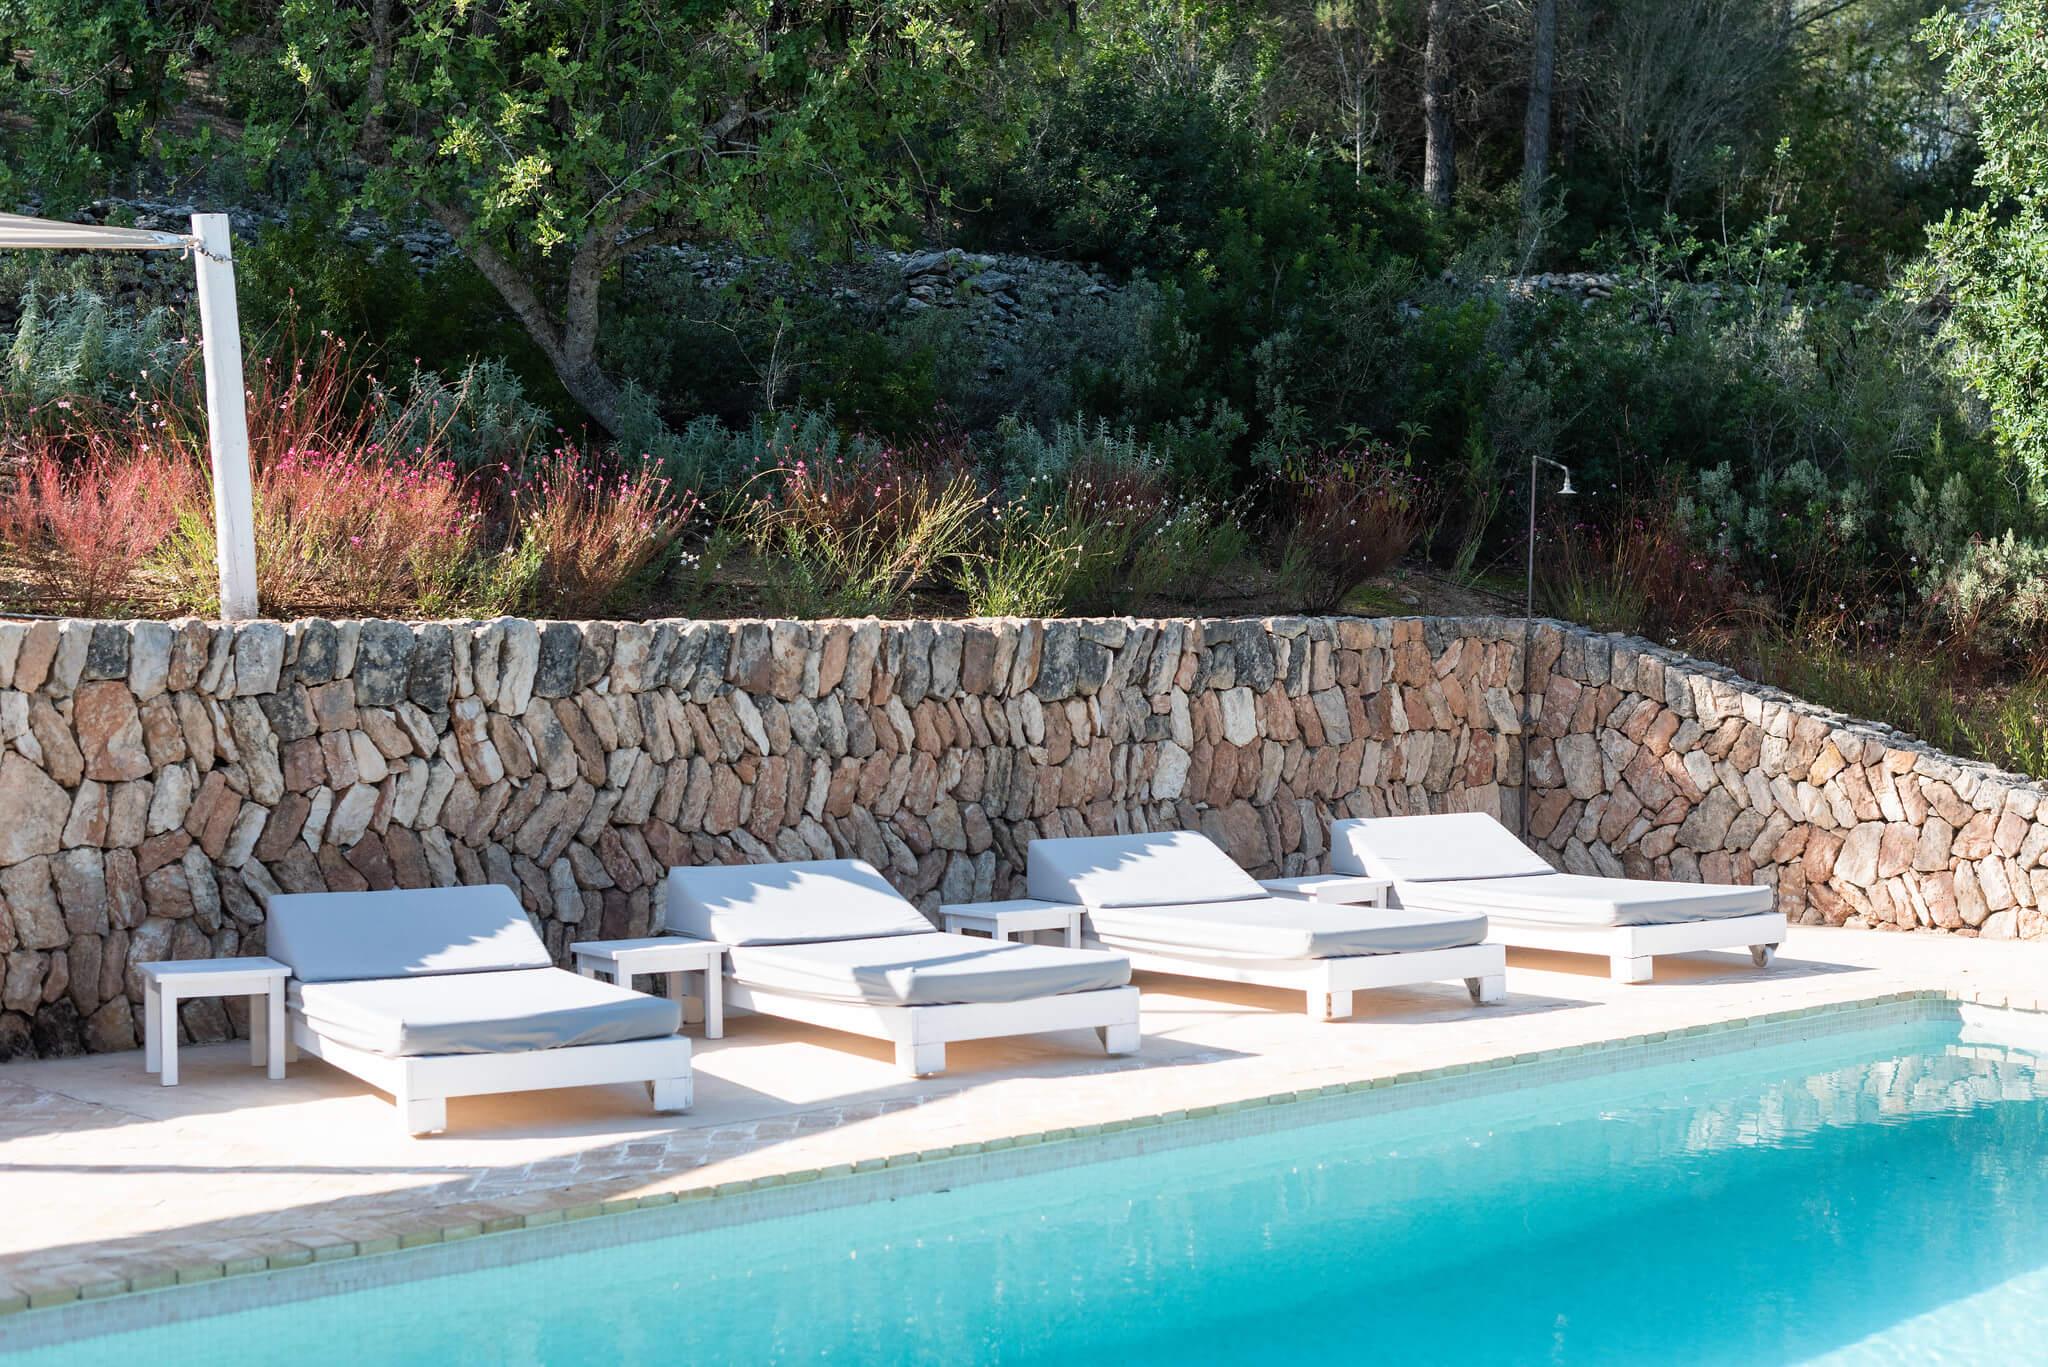 https://www.white-ibiza.com/wp-content/uploads/2020/06/white-ibiza-villas-casa-arabella-exterior-sunloungers.jpg